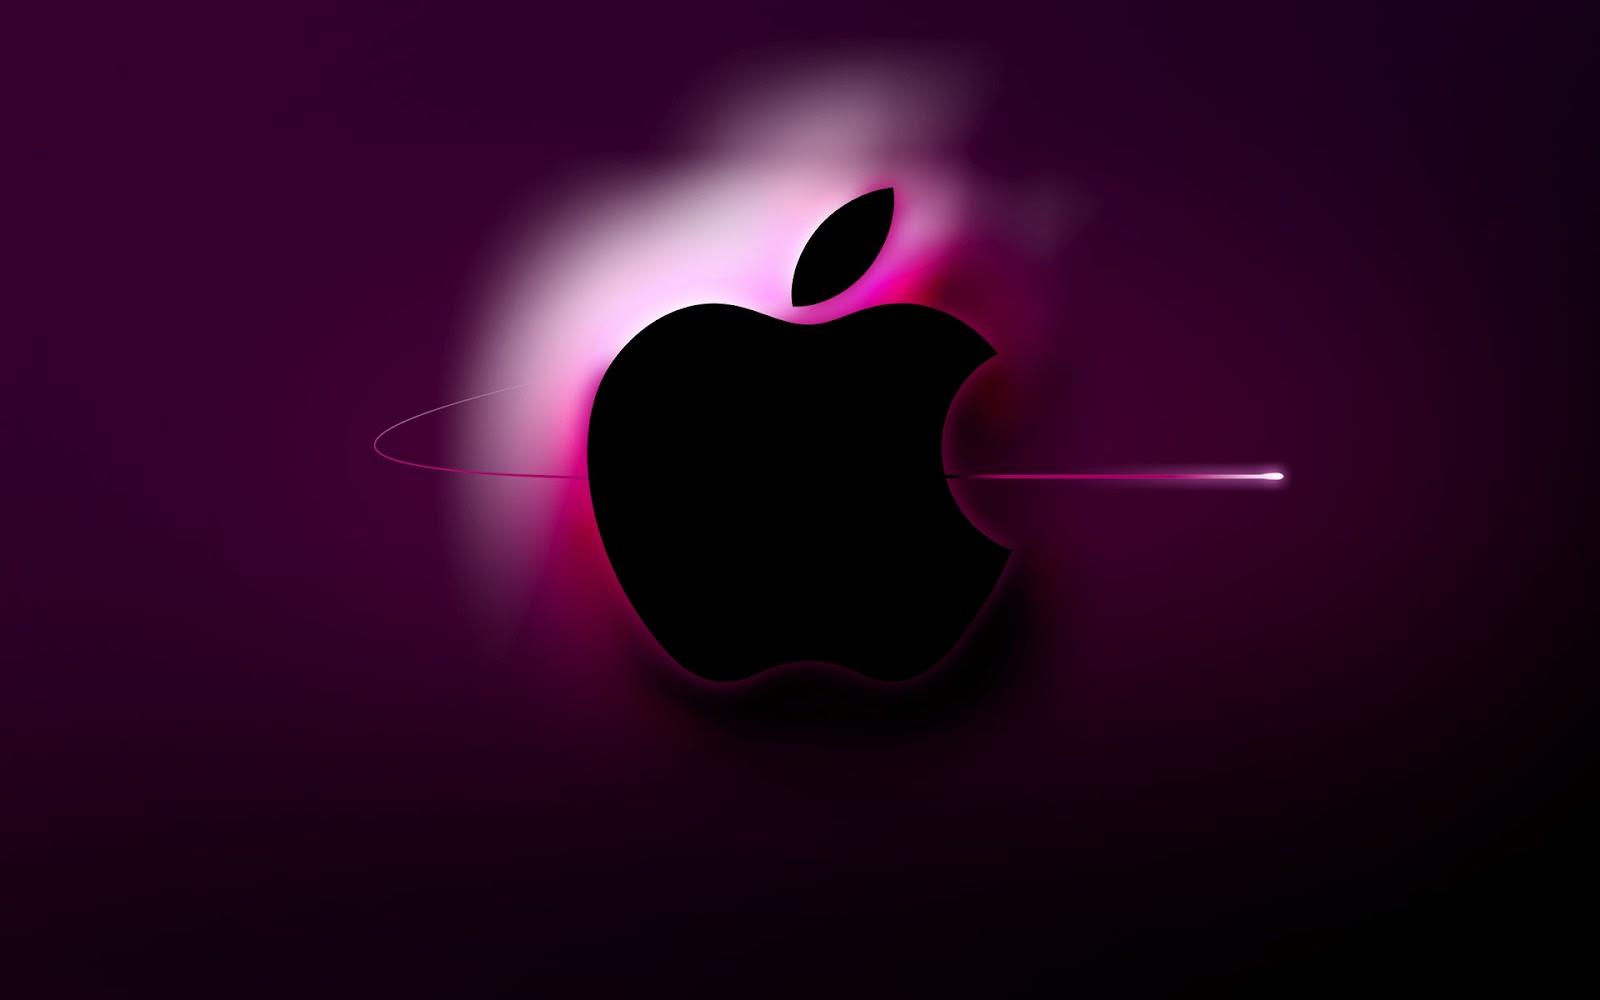 wallpapers apple iphone wallpapers apple iphone wallpapers apple 1600x1000